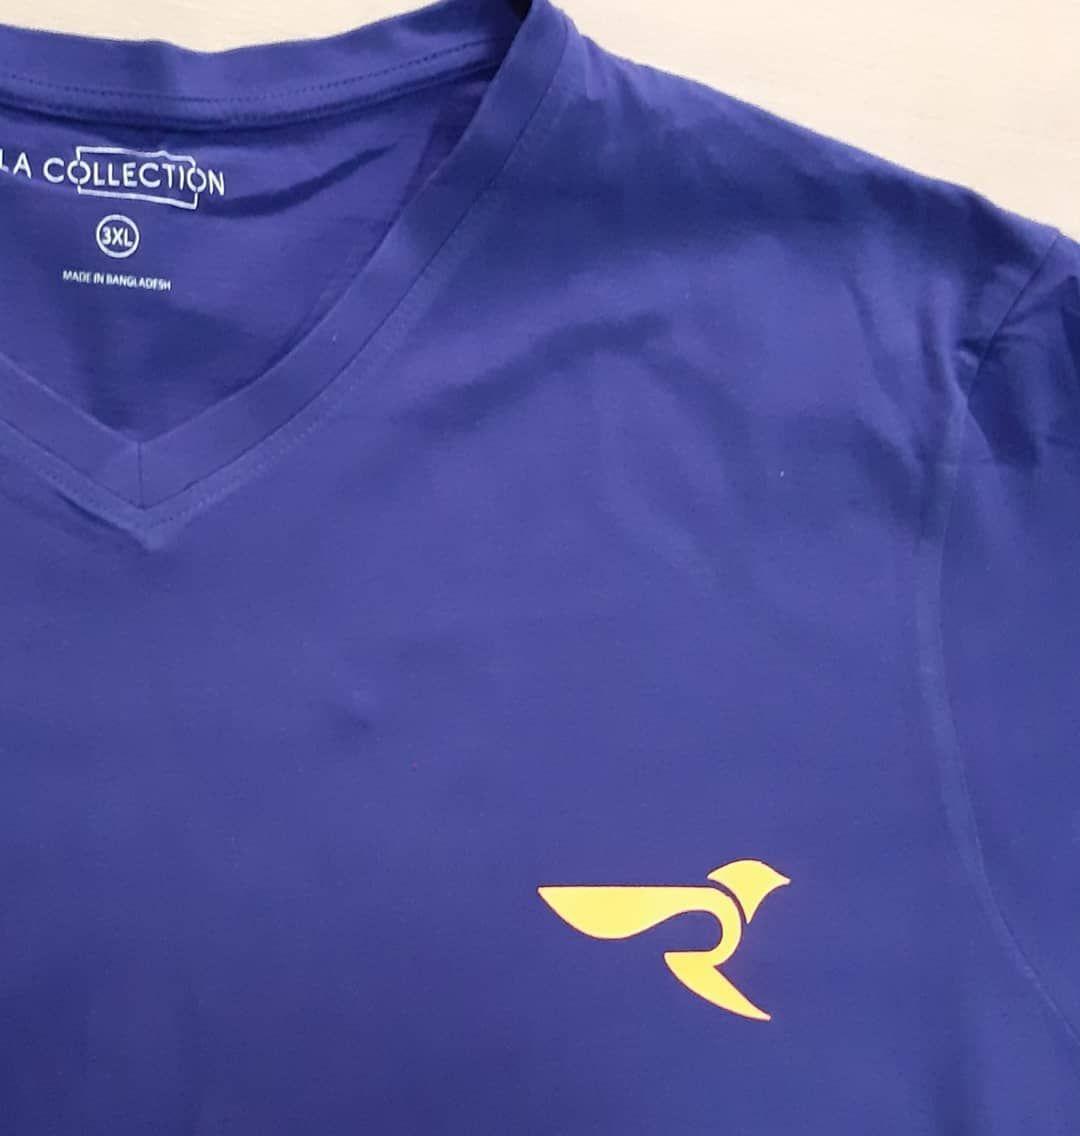 T Shirts Whatsapp 00971 50 807 1291 Engineer Aviation Airbus Boeing Flightcrew Flightattendant Flightattendantlife Pil In 2020 Mens Tops Mens Polo Shirts Women